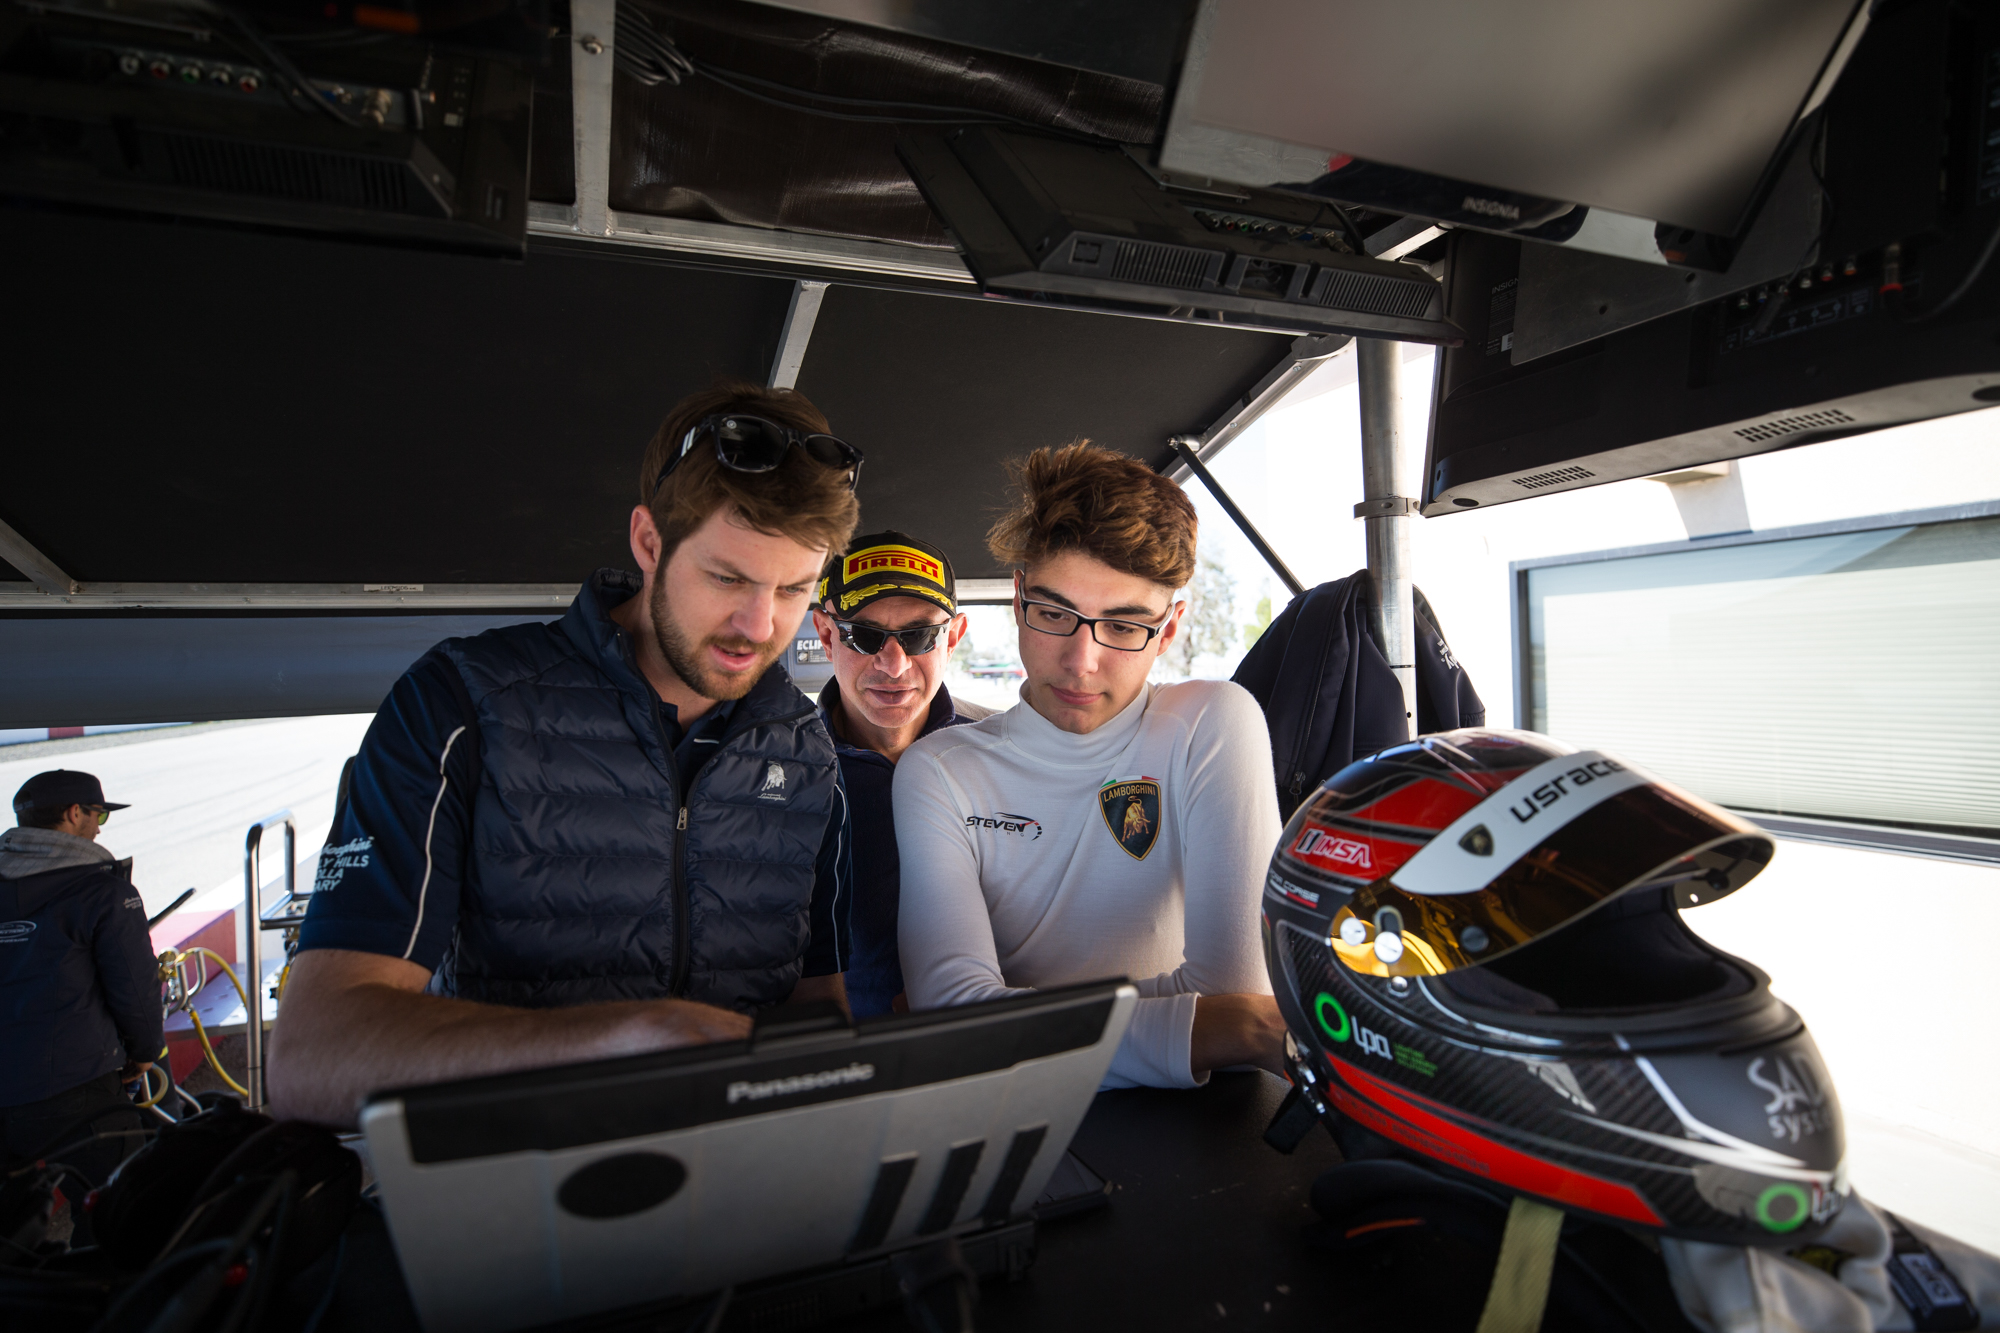 Steven-Racing-20180221-73295.jpg